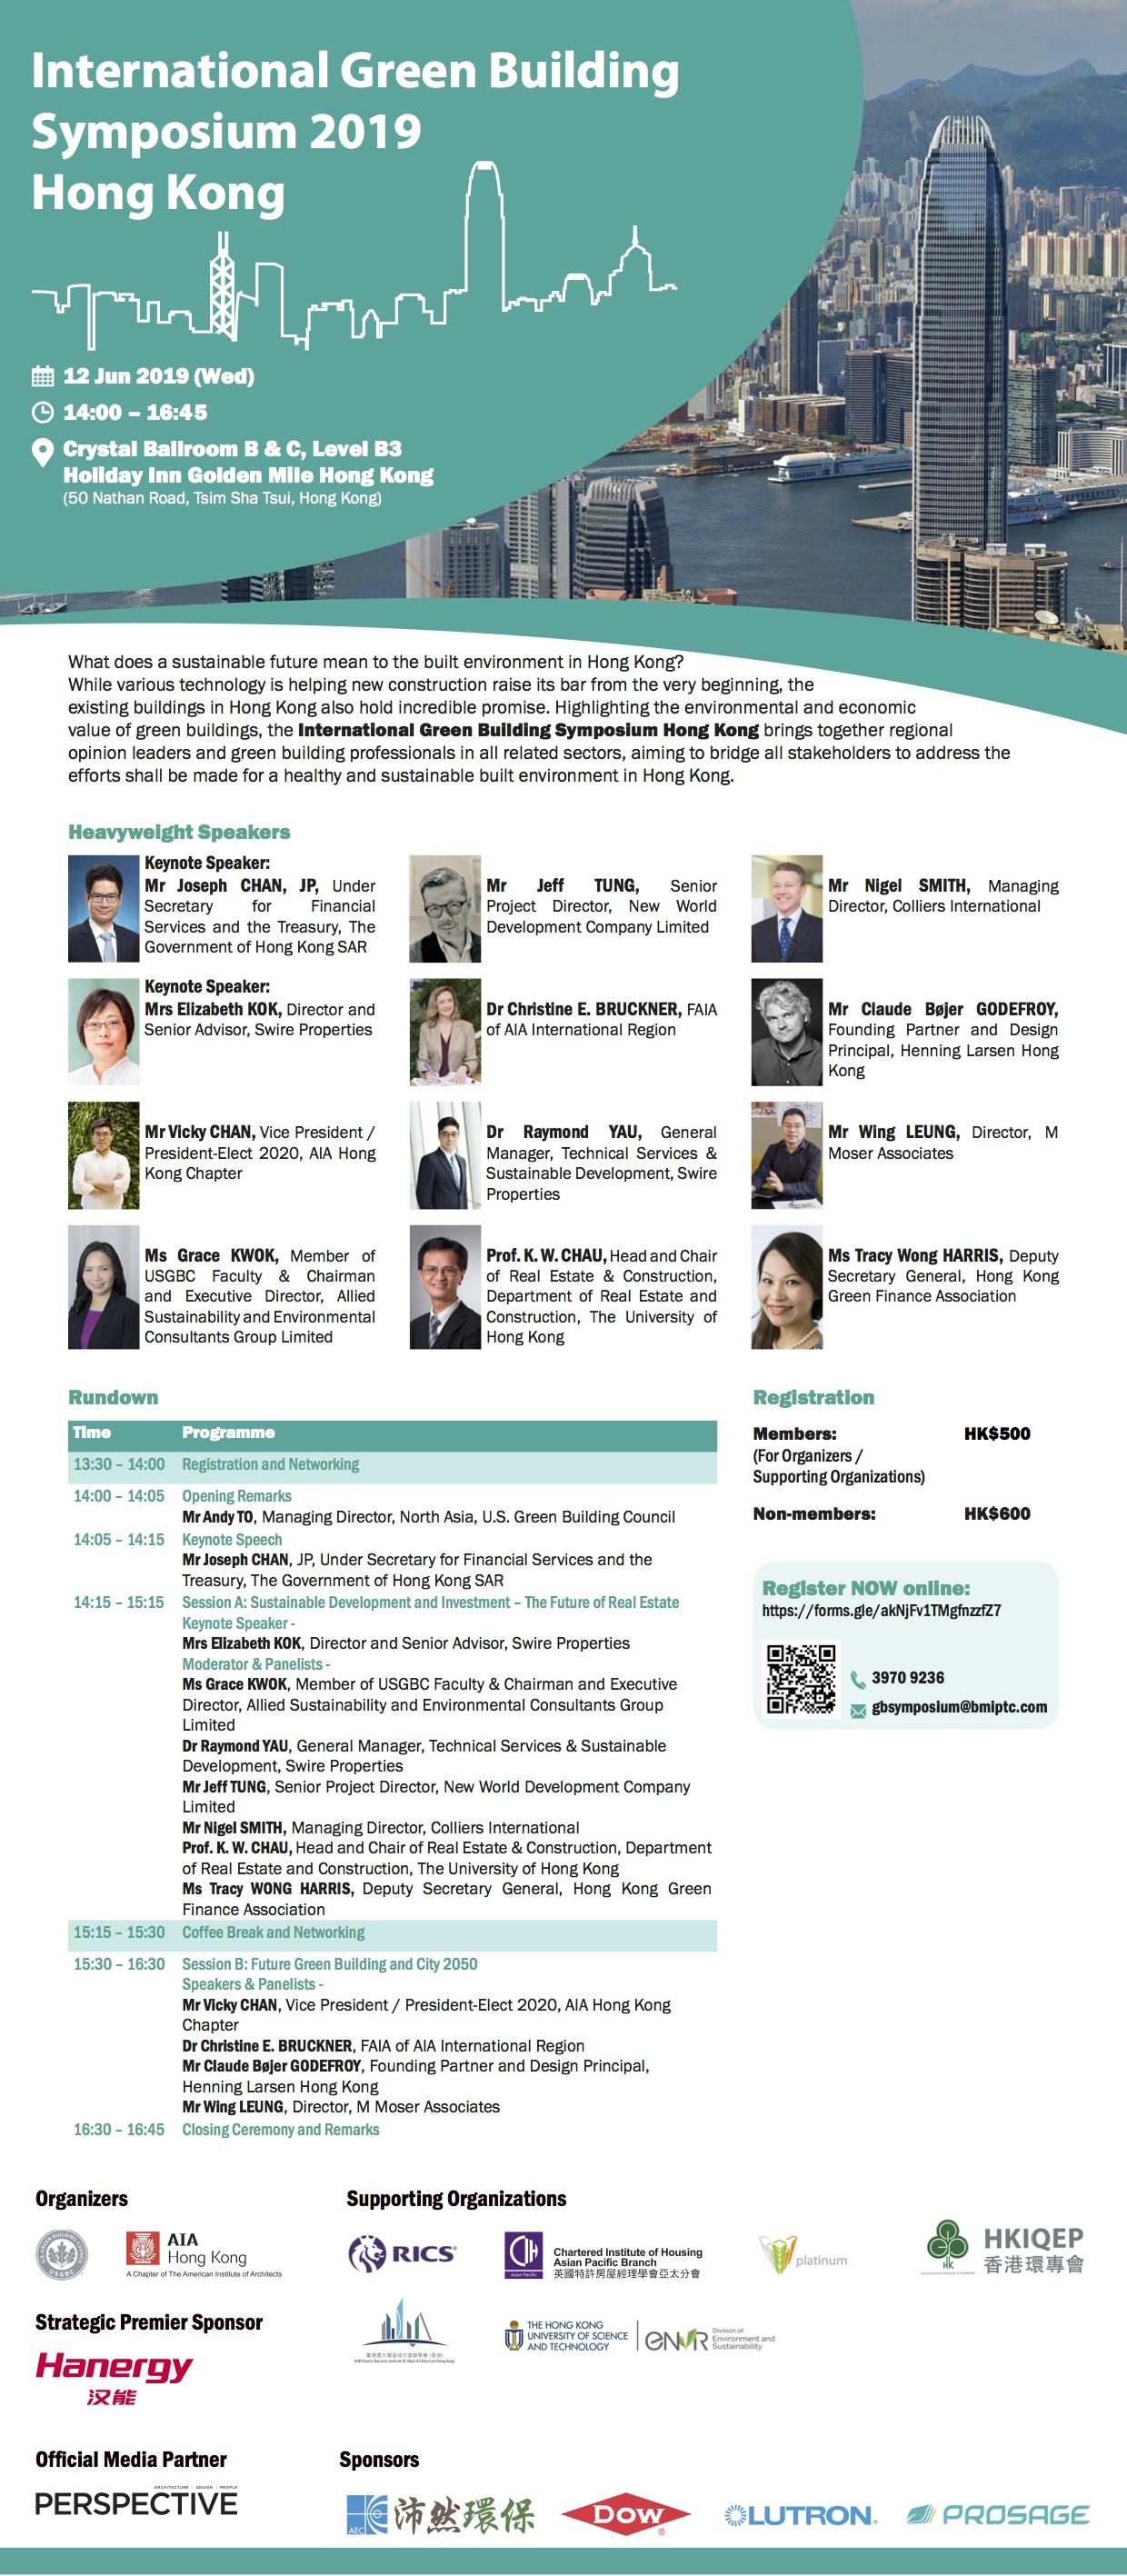 USGBC IGBS HK Agenda 612 copy.jpg